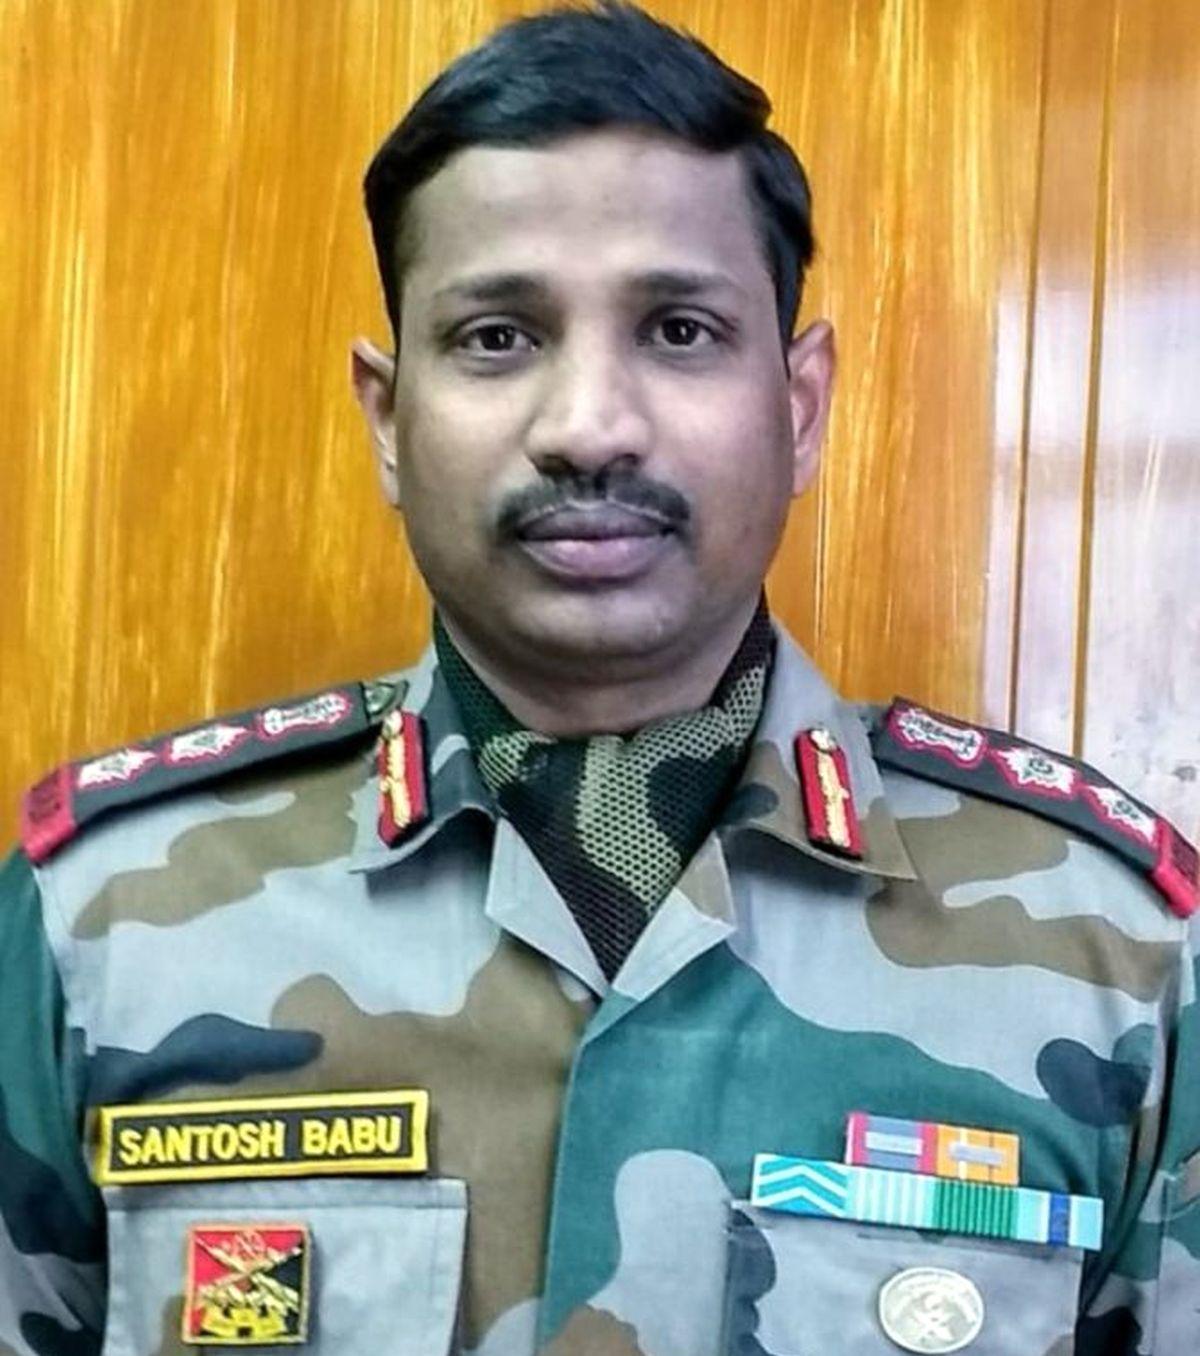 Col Santosh Babu, hero of Galwan, gets Maha Vir Chakra